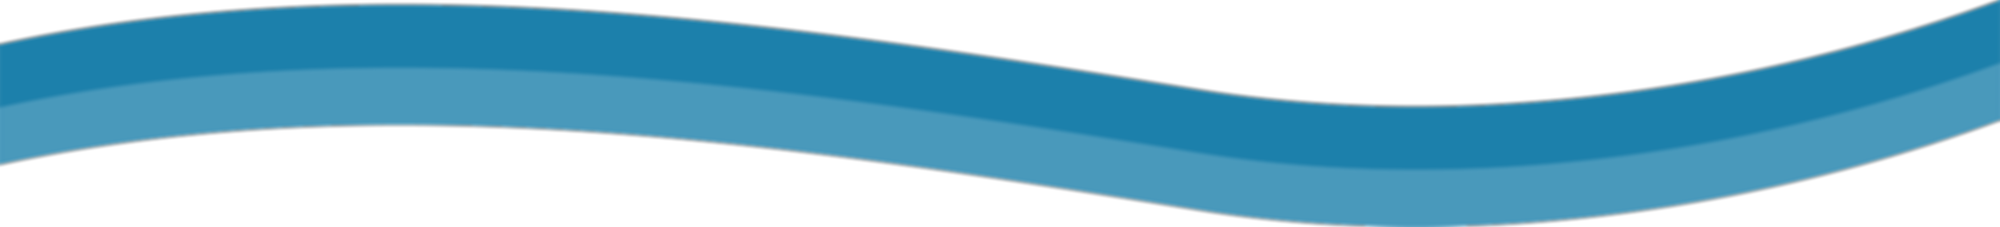 clipart-wave-divider-3.png